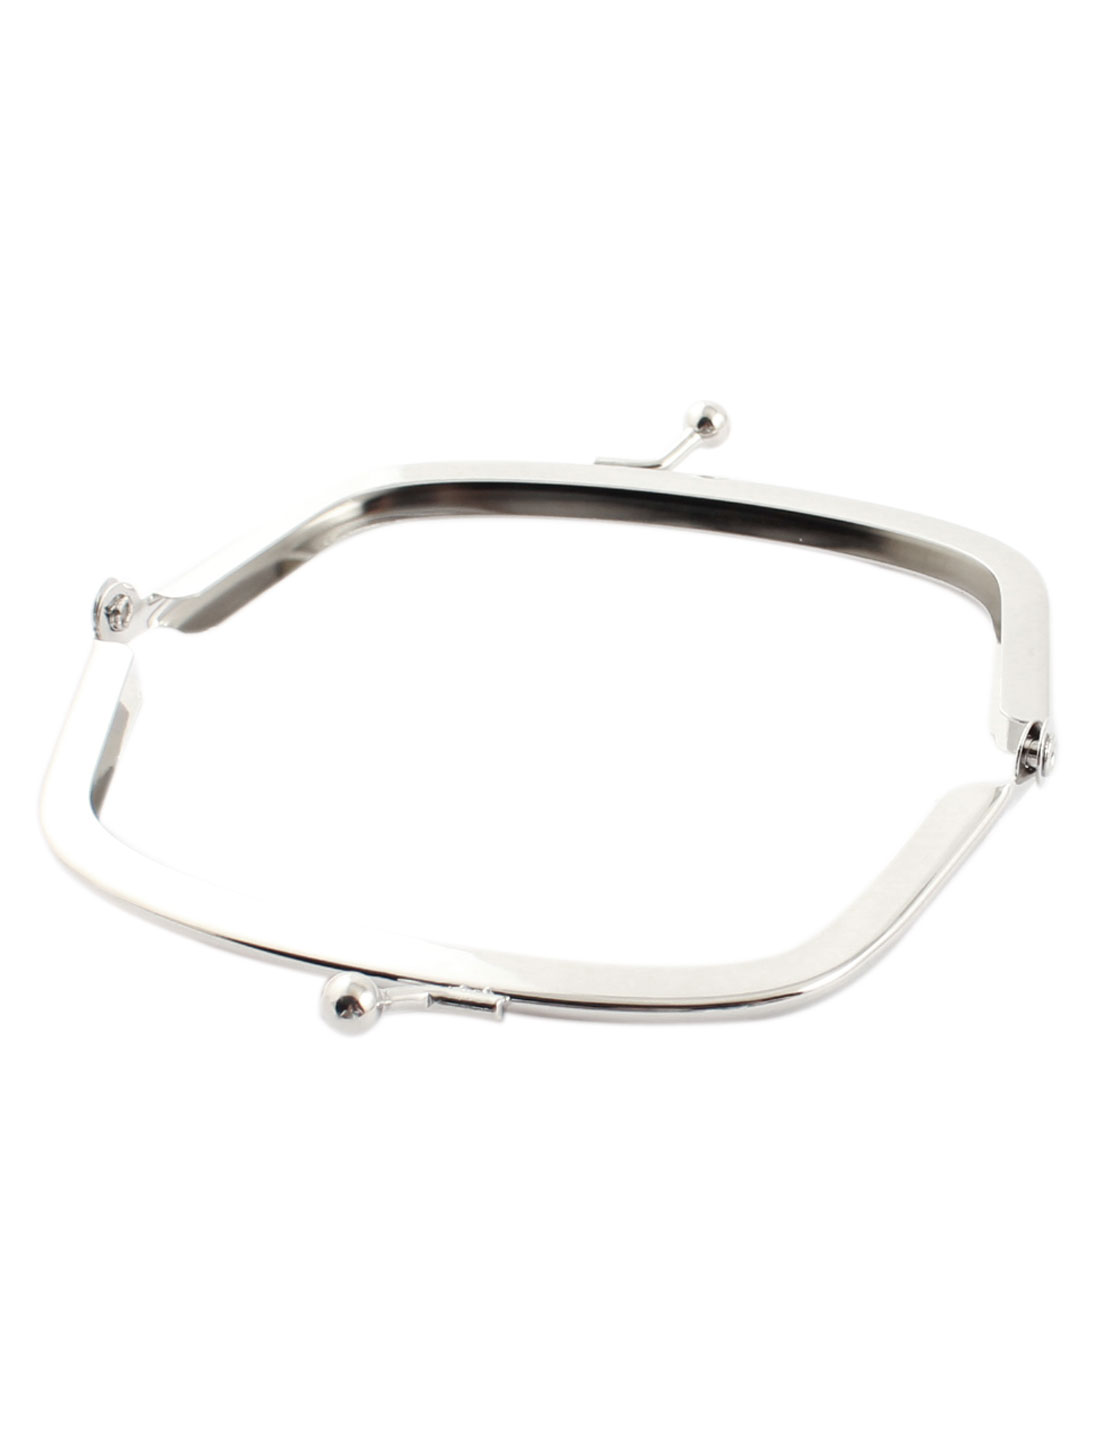 Pouch Bag Arch Shaped Kisslock Clasp Metal Purse Frame Silver Tone 10.5cm Long